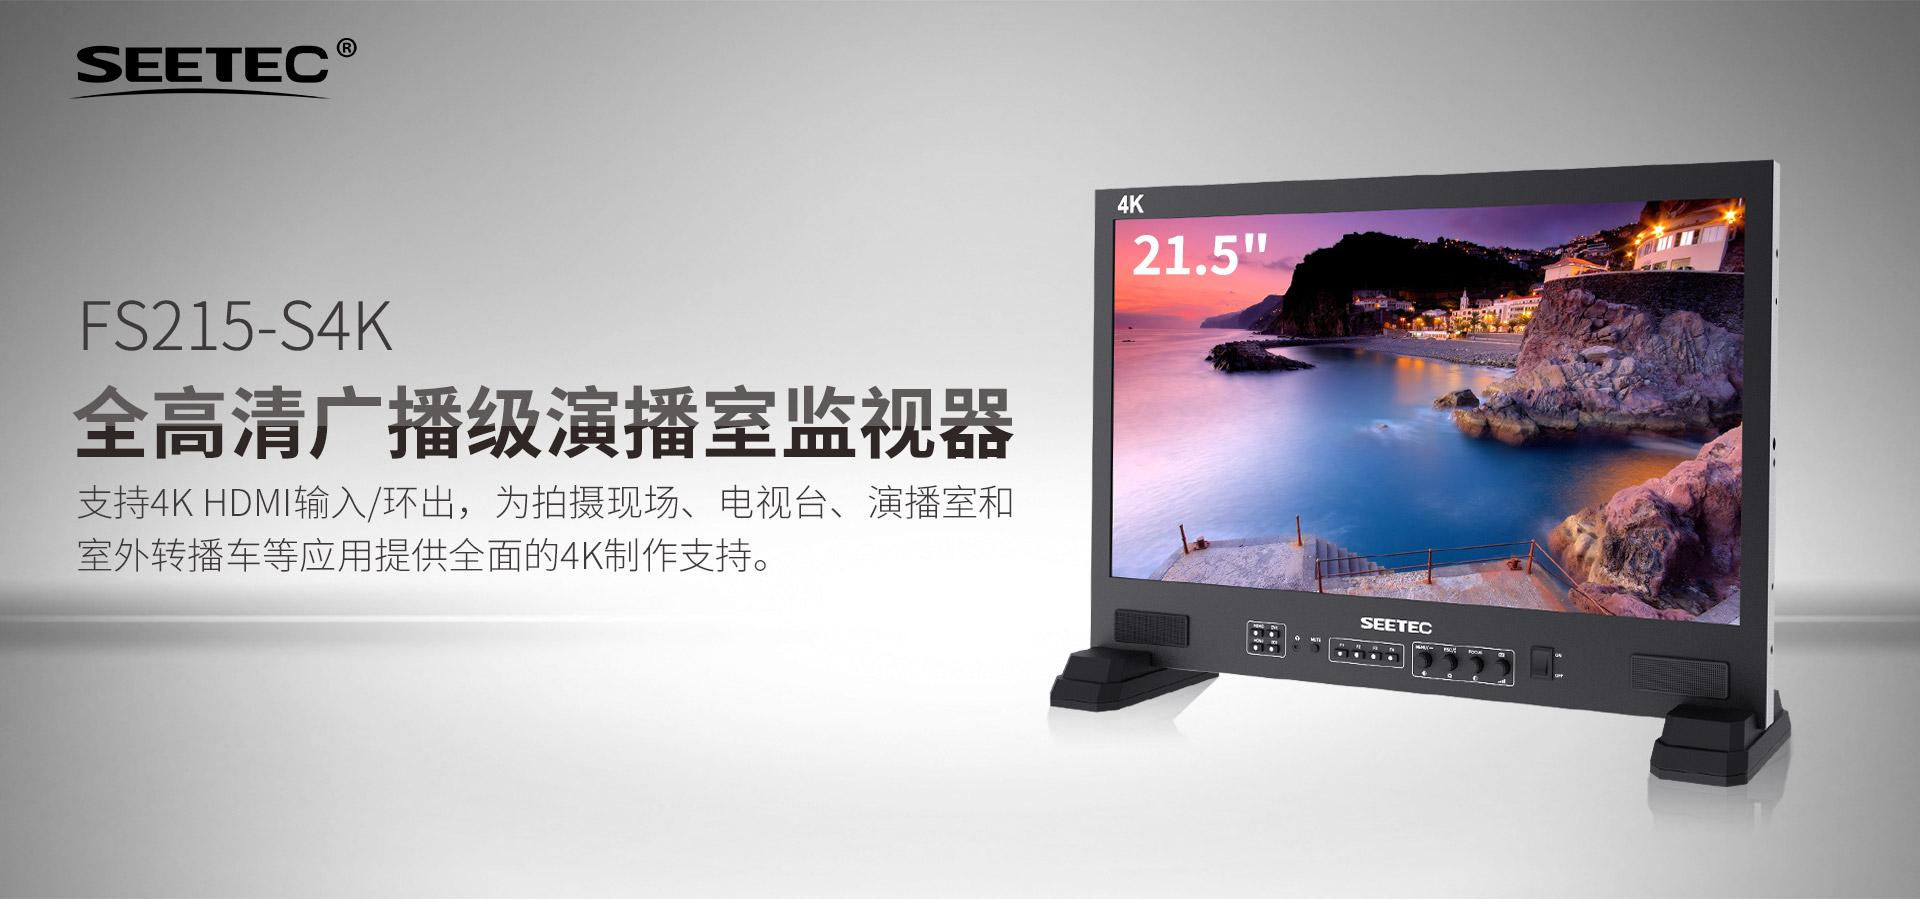 SEETEC215寸广播级演播室监视器